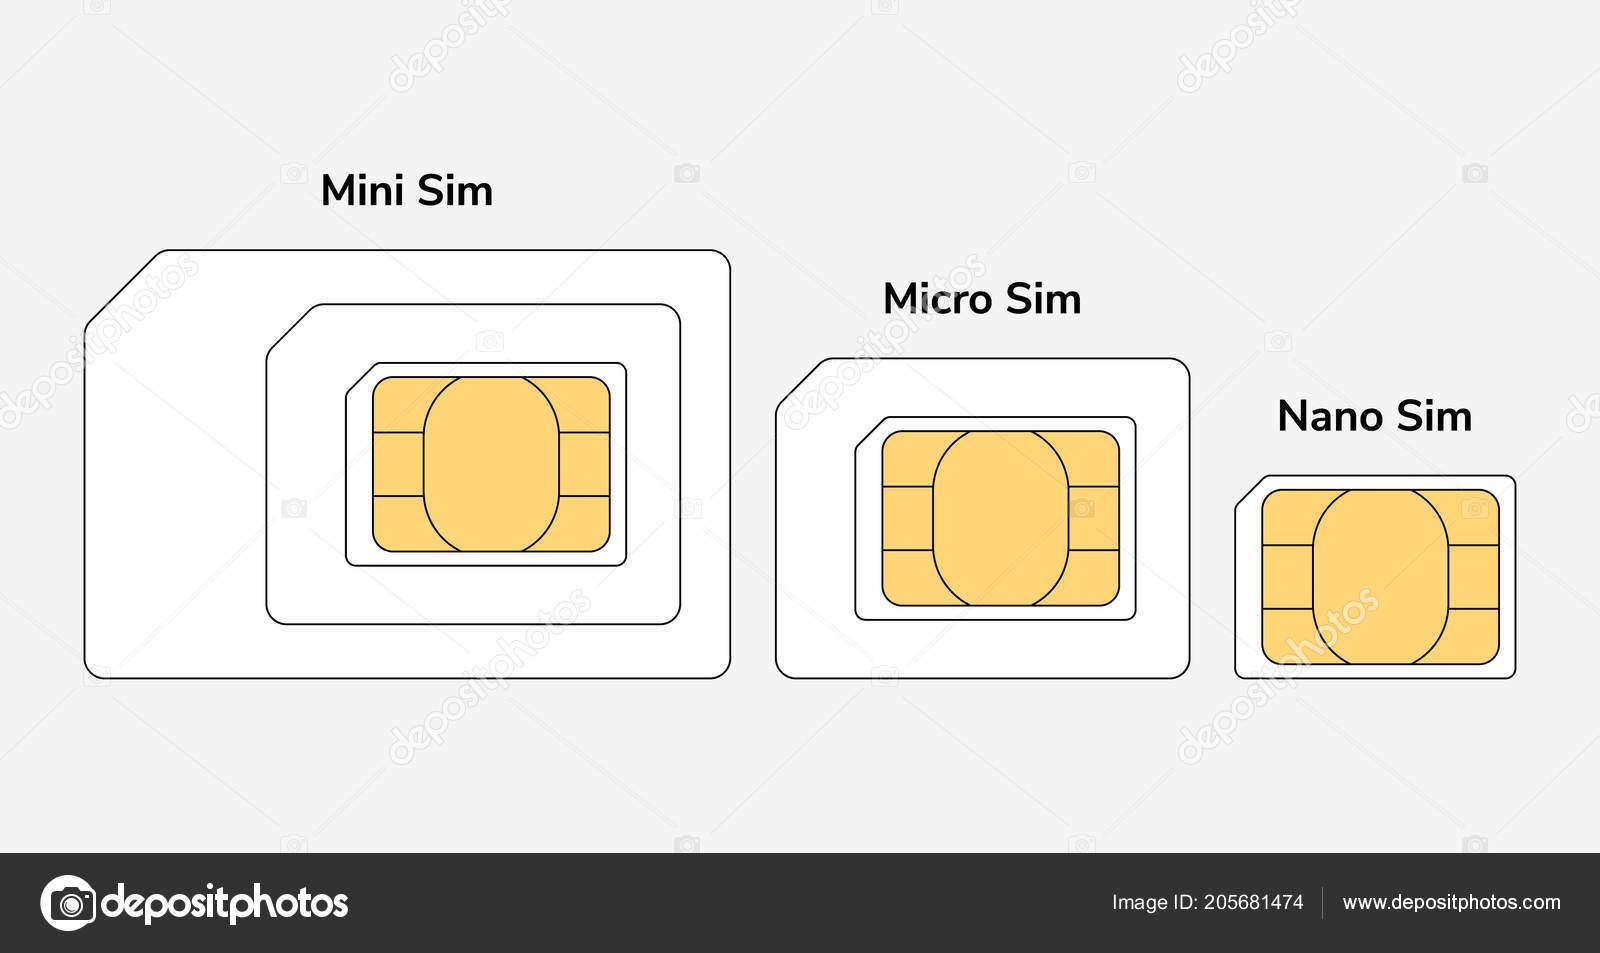 Nano Karte.Vektor Illustration Sim Karte Micro Mini Nano Stockvektor